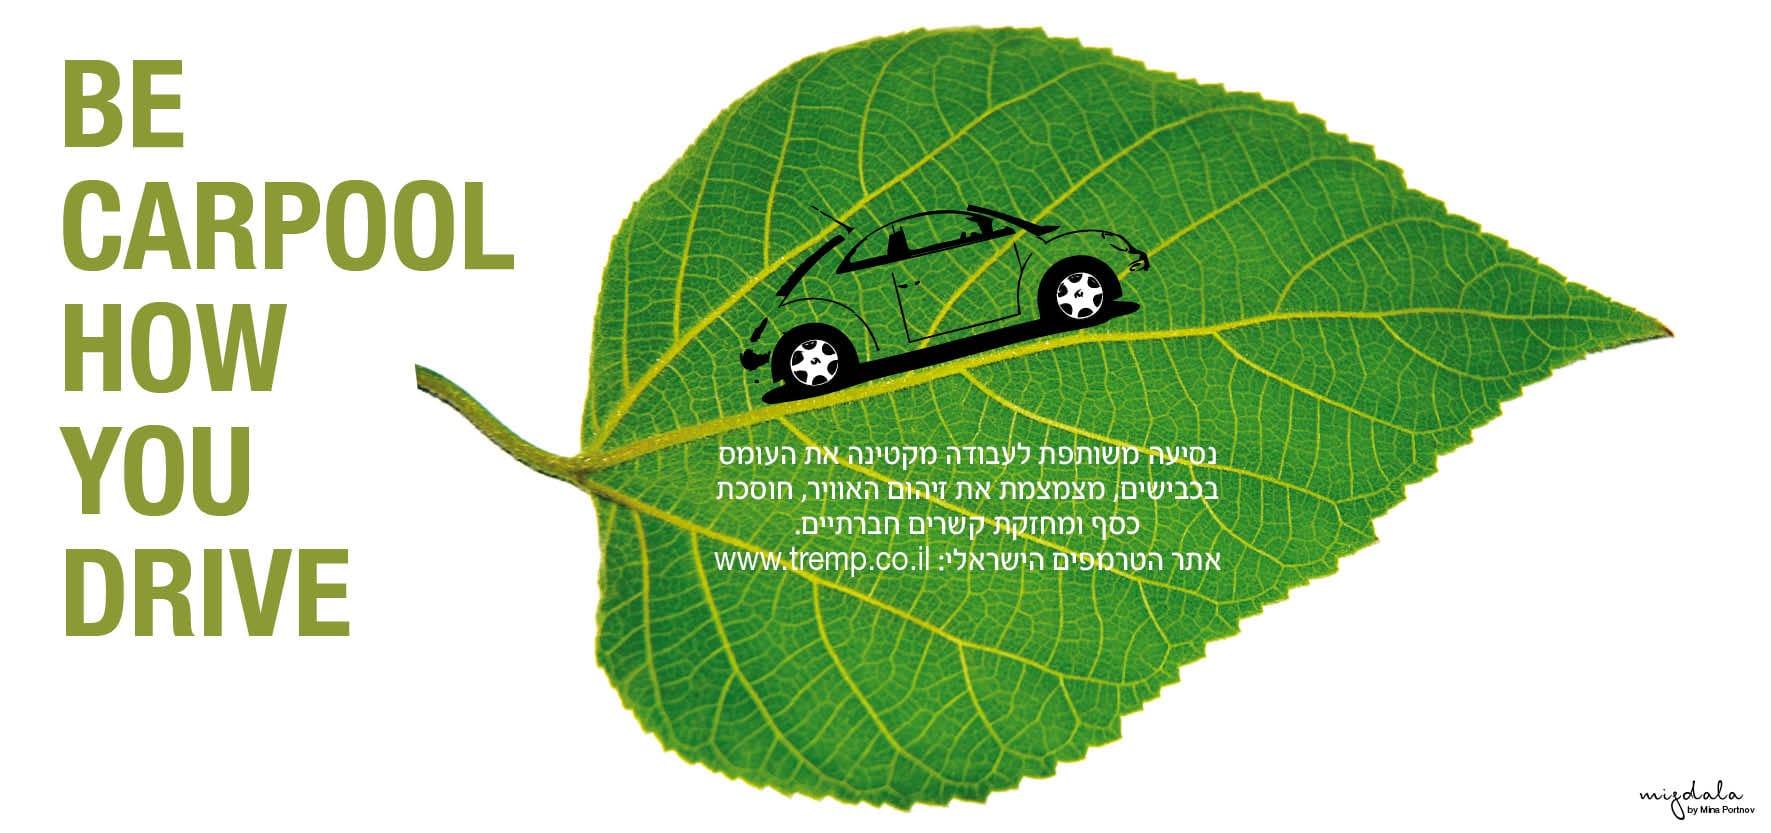 BE CARPOOL HOW YOU DRIVE